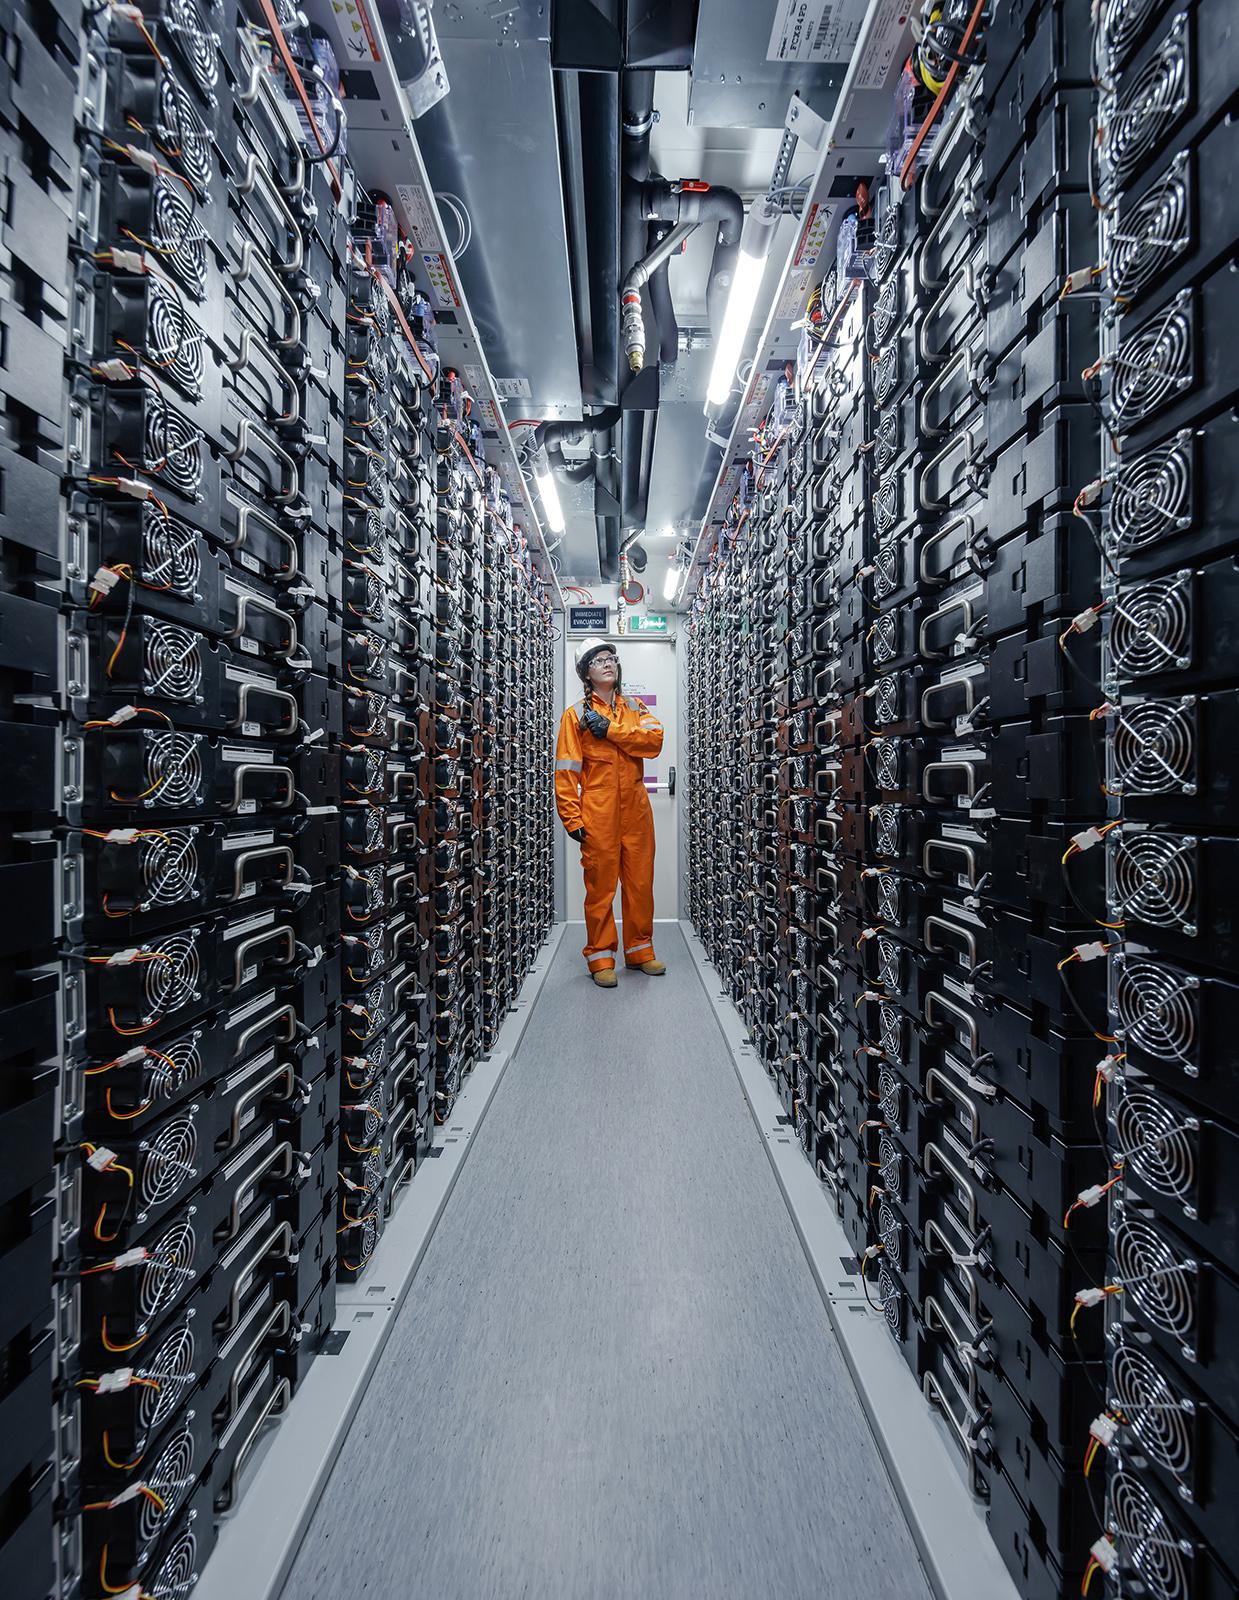 Battery storage capacity.